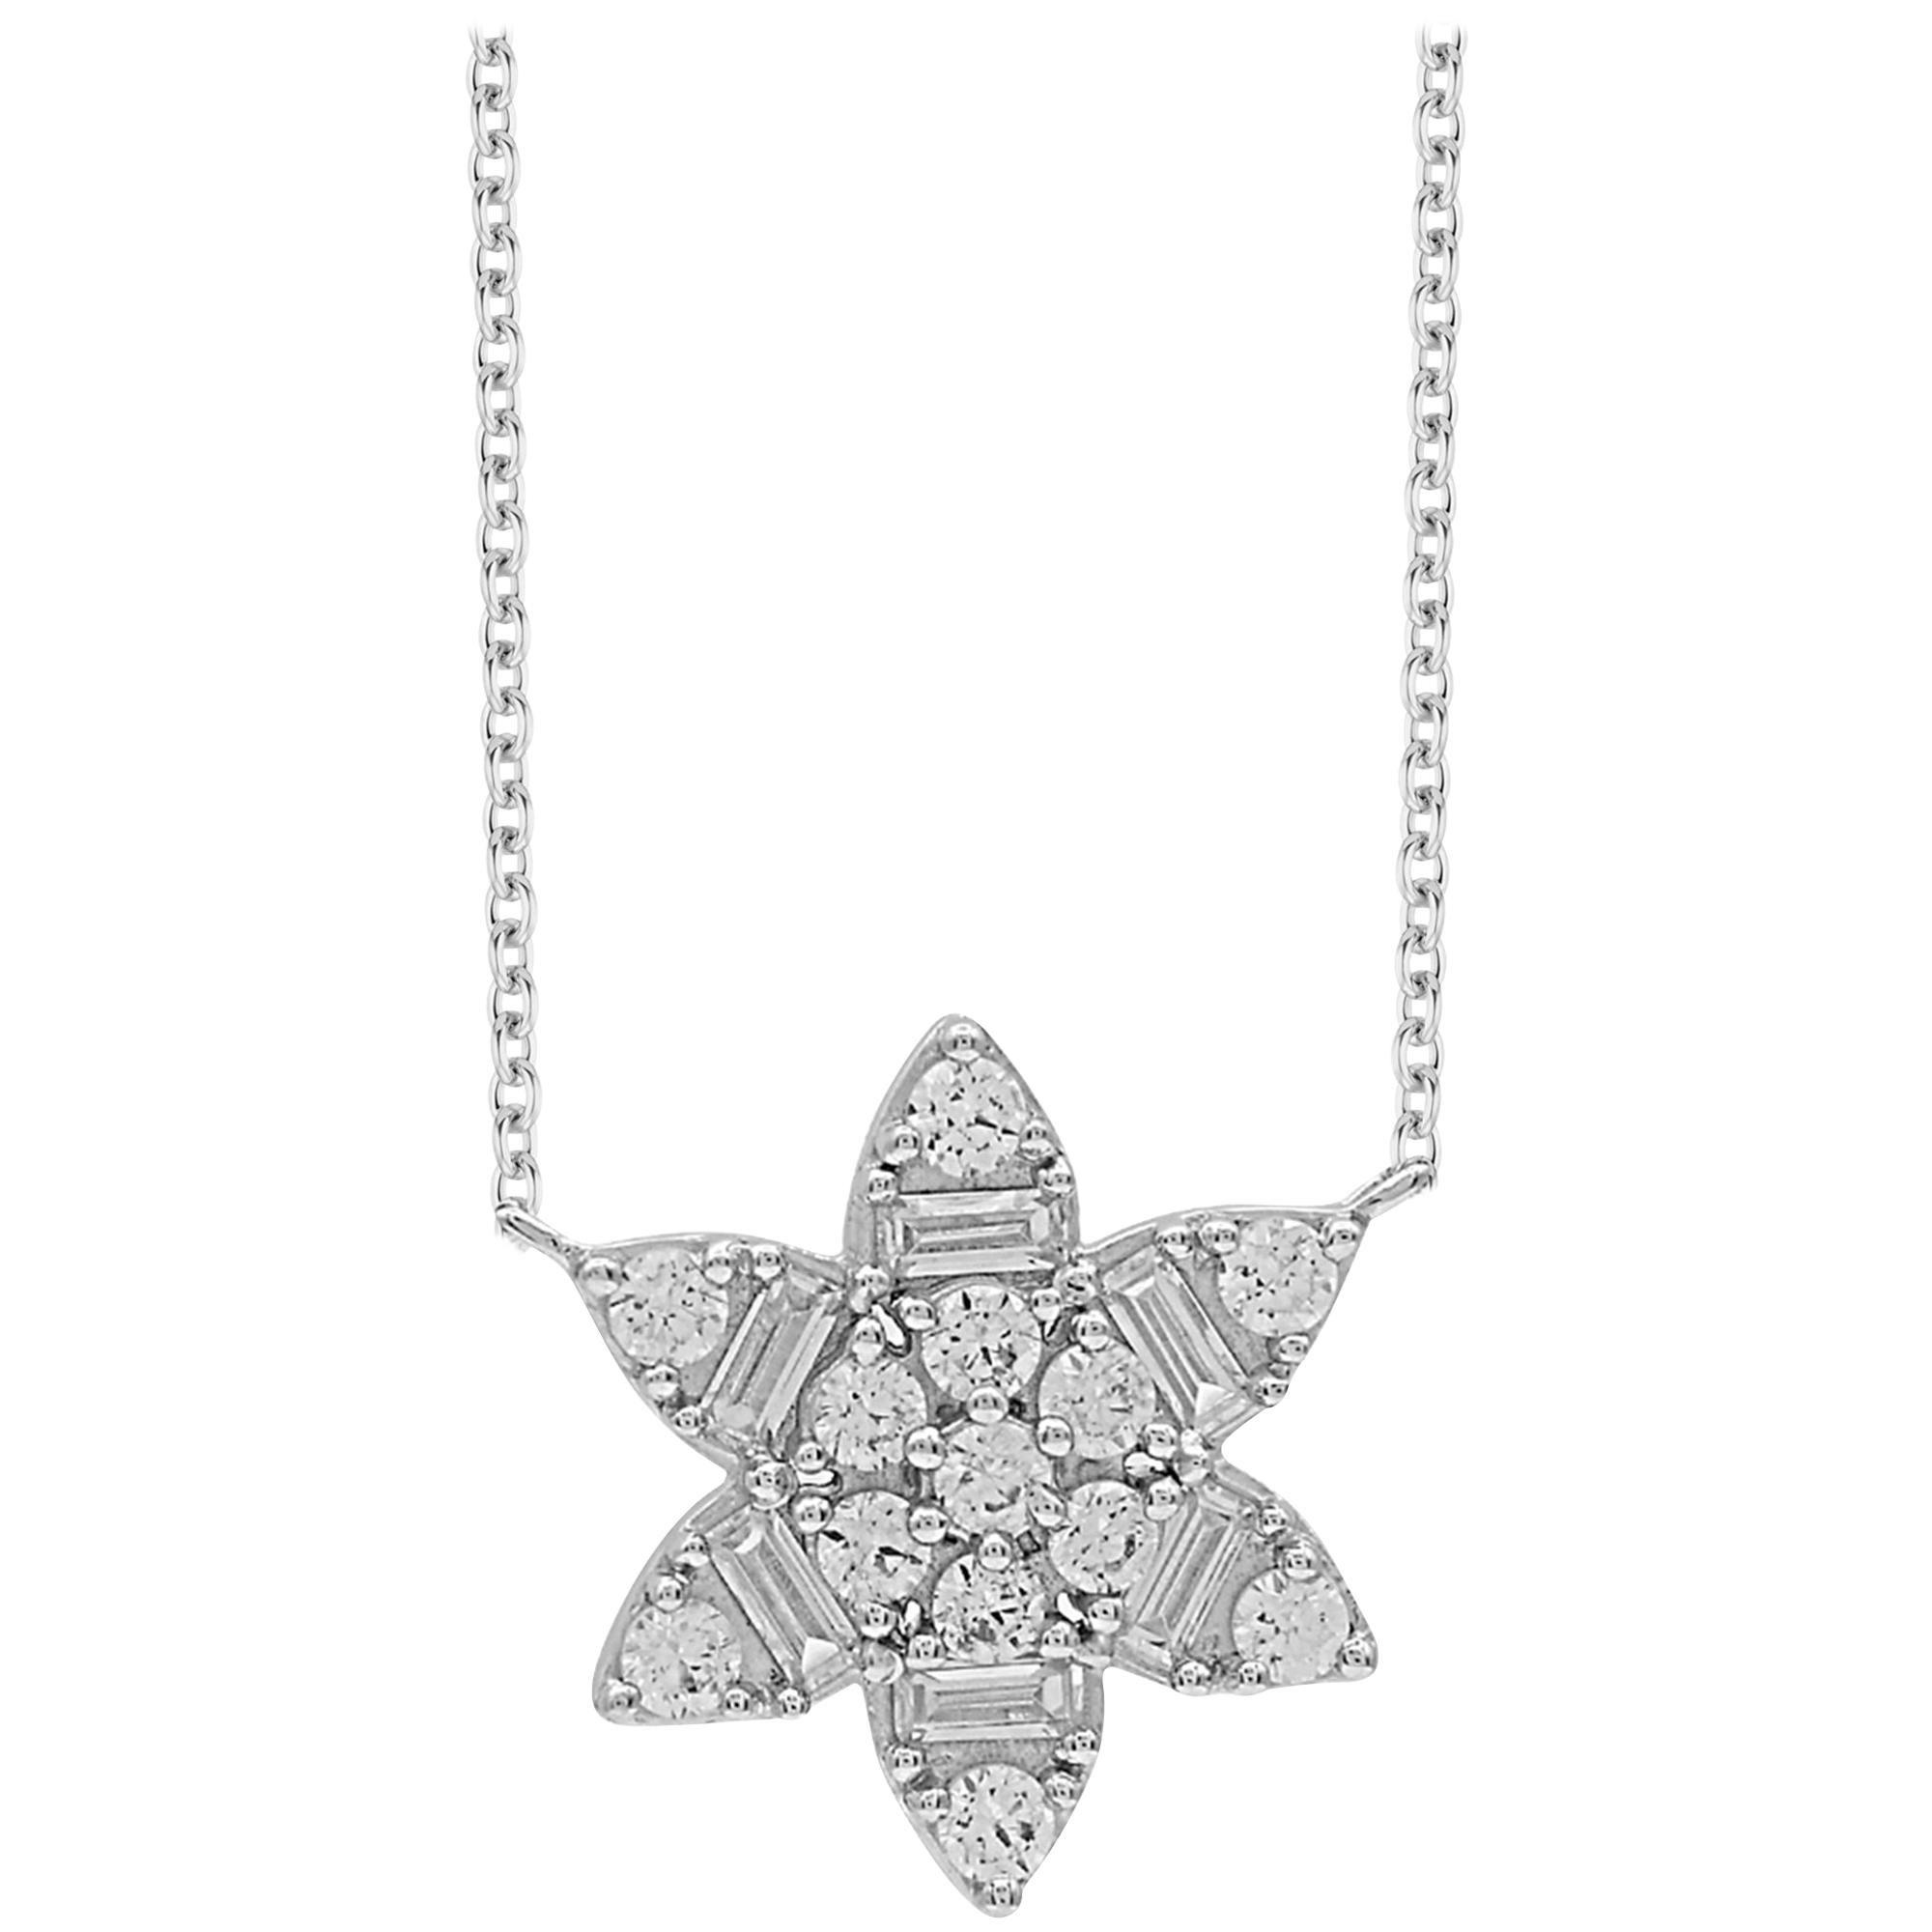 TJD 0.50 Carat Round & Baguette Diamond 14 Karat White Gold Flower Necklace